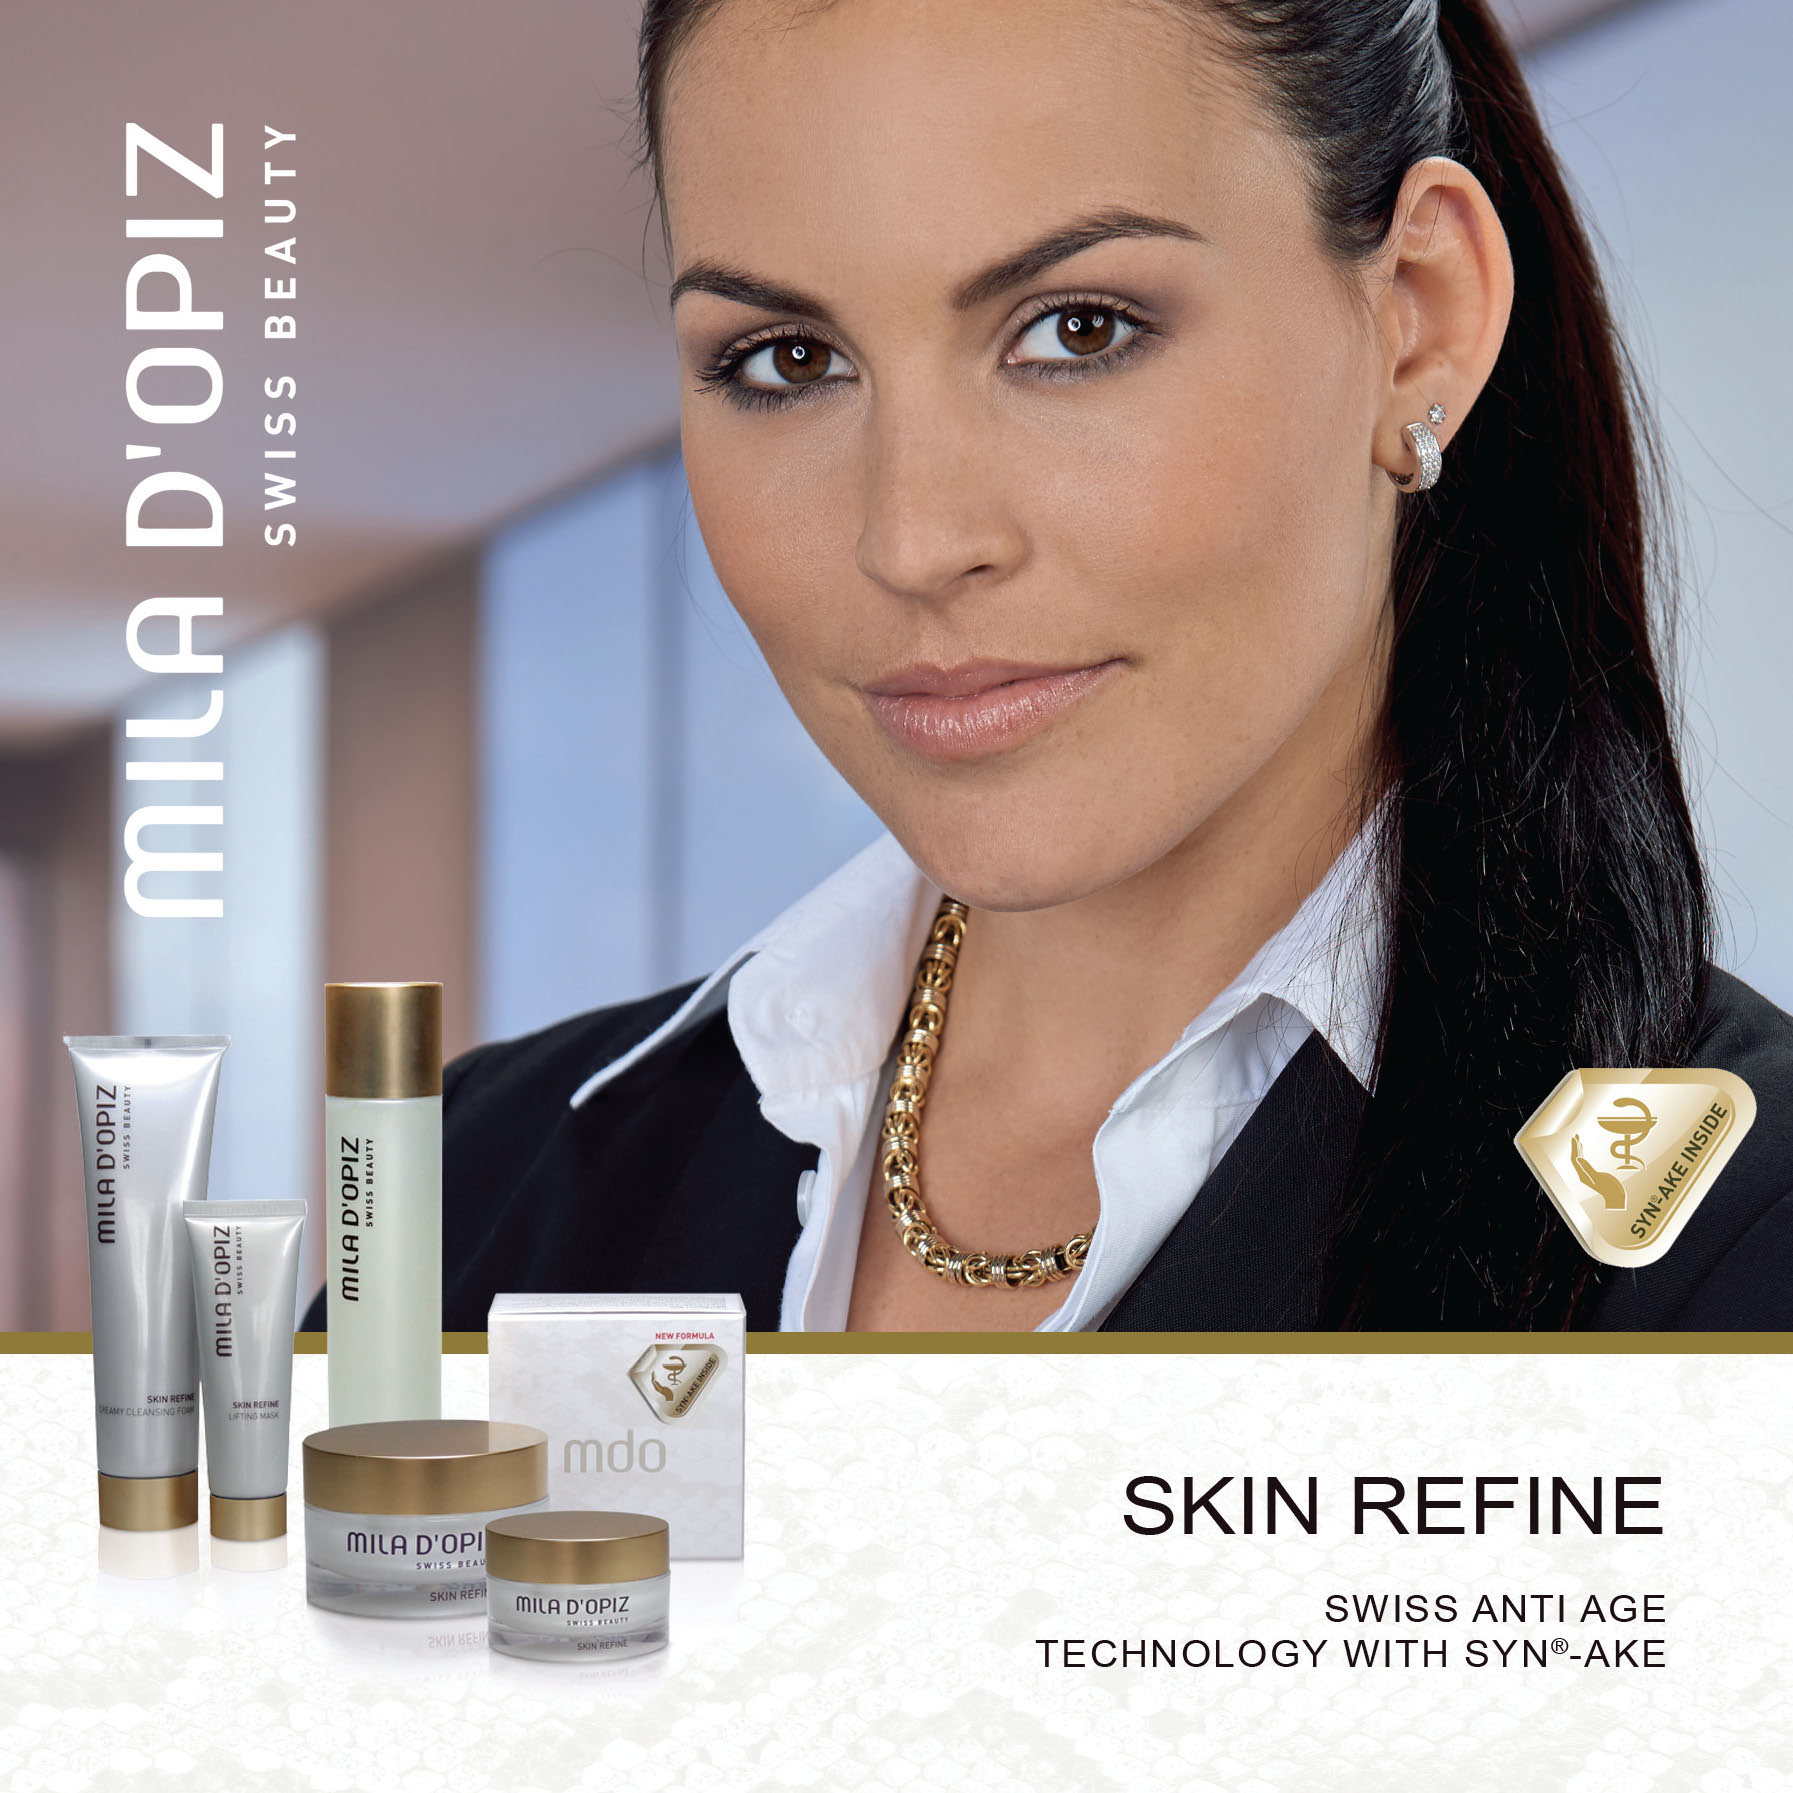 skin refine